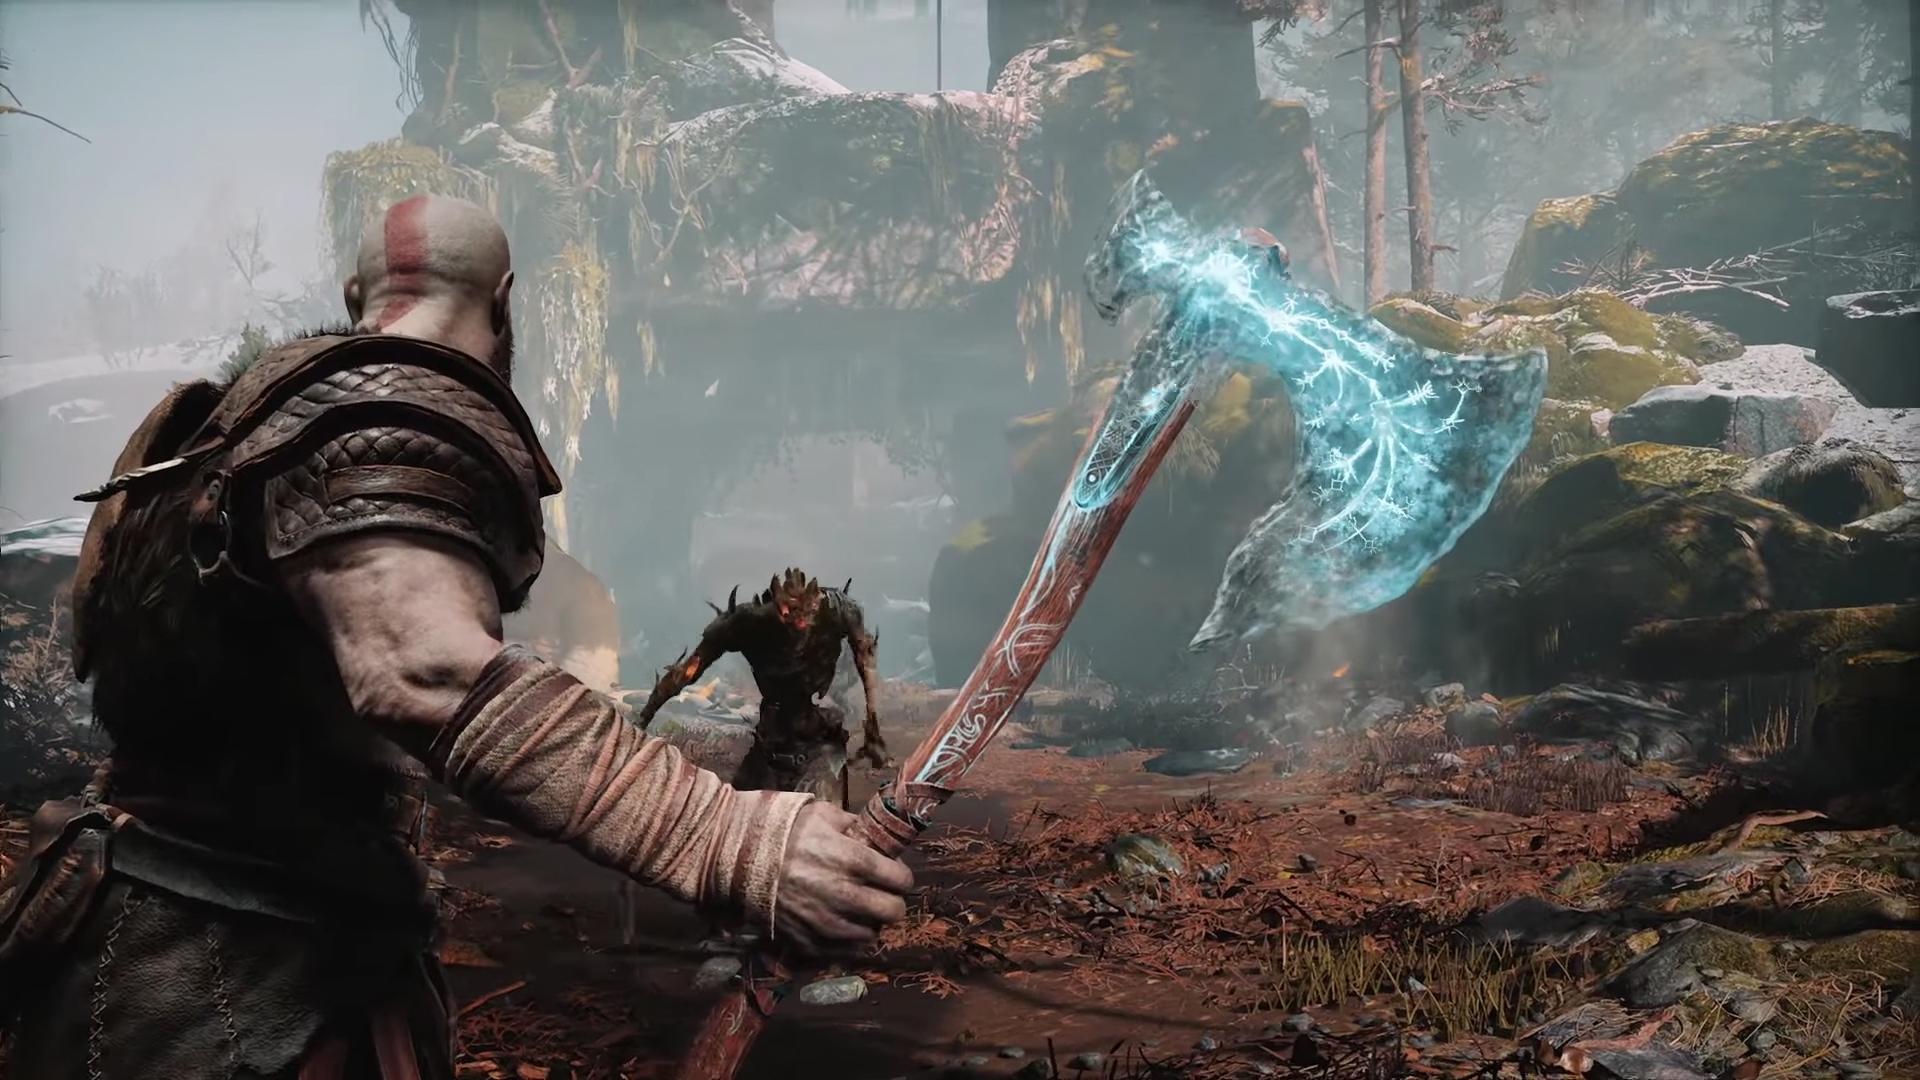 God of War Kratos's Axe